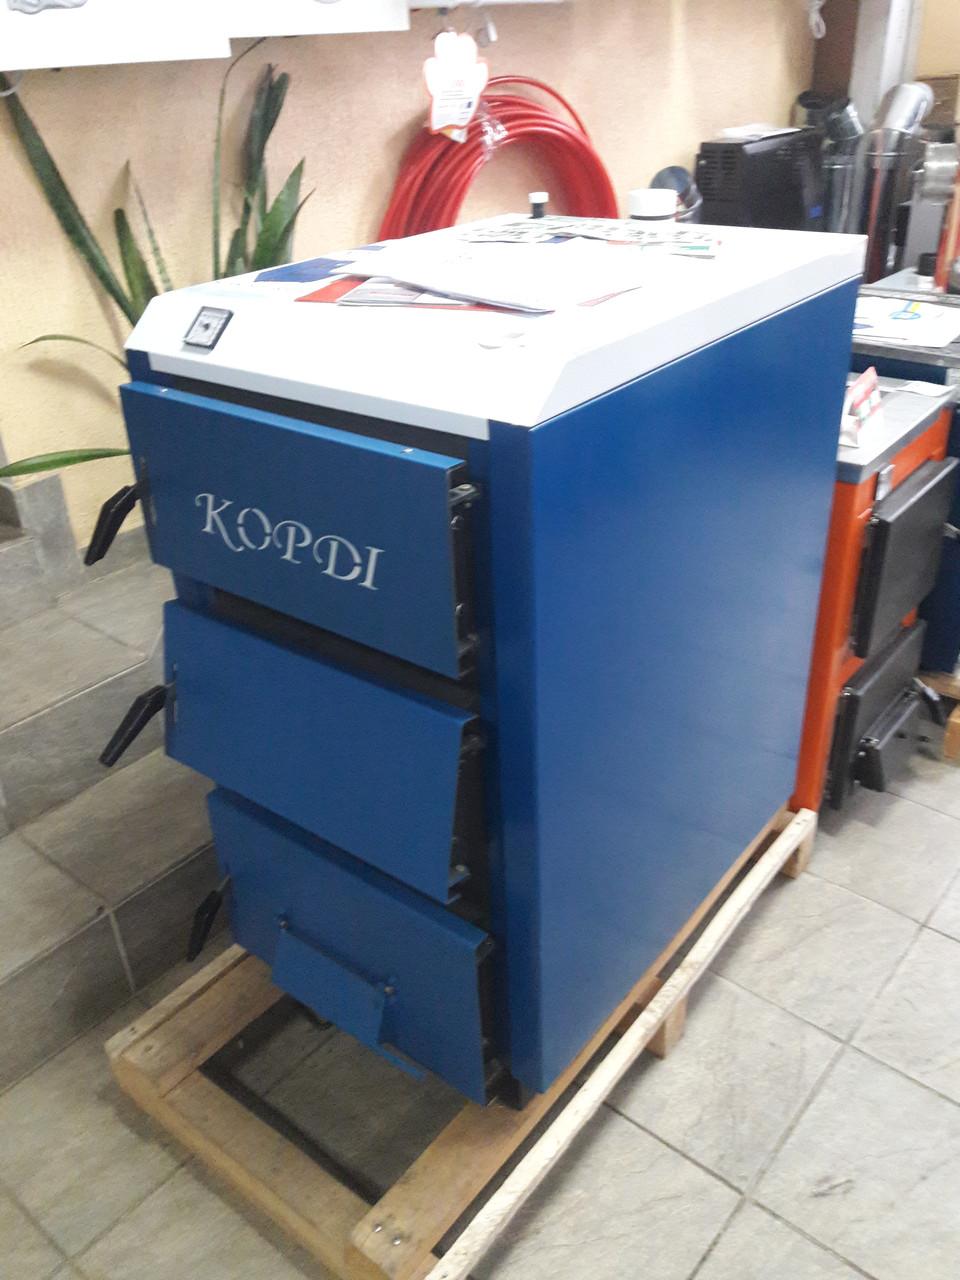 Корди АОТВ -26-30 Е твердотопливный котел 30 кВт + автоматика почти ДАРОМ